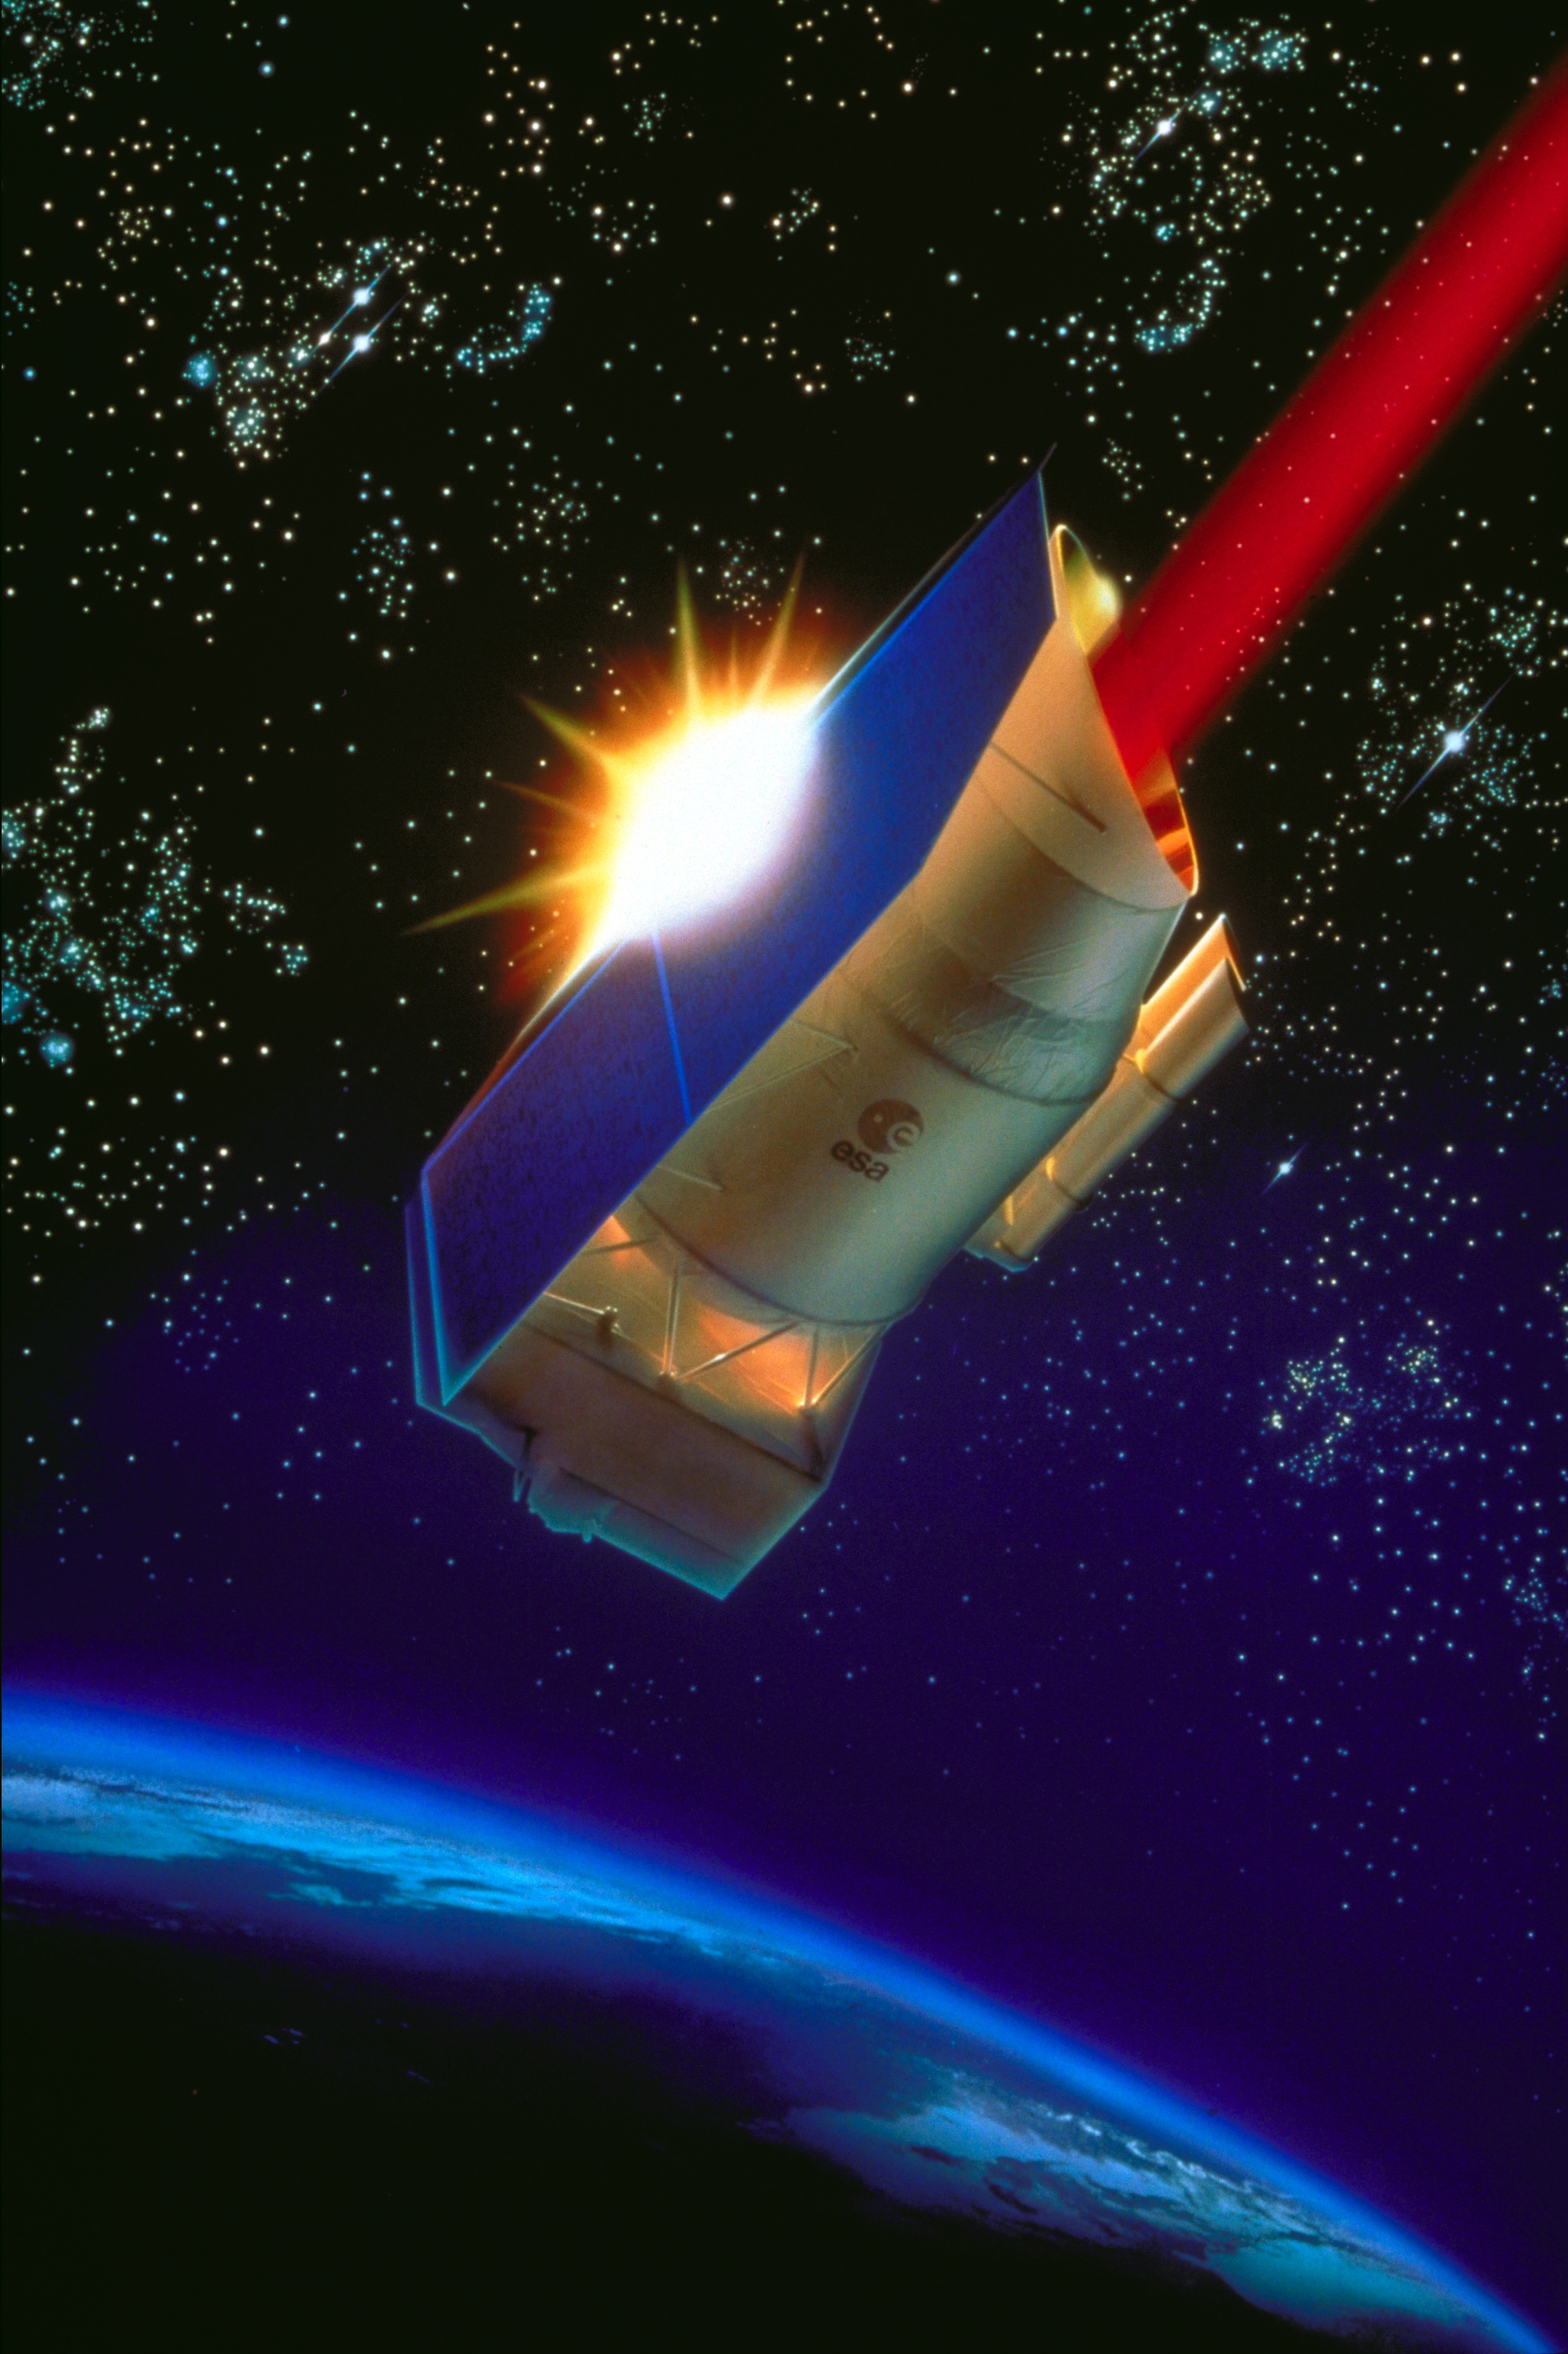 1567220031959-ISO-spacecraft.jpg